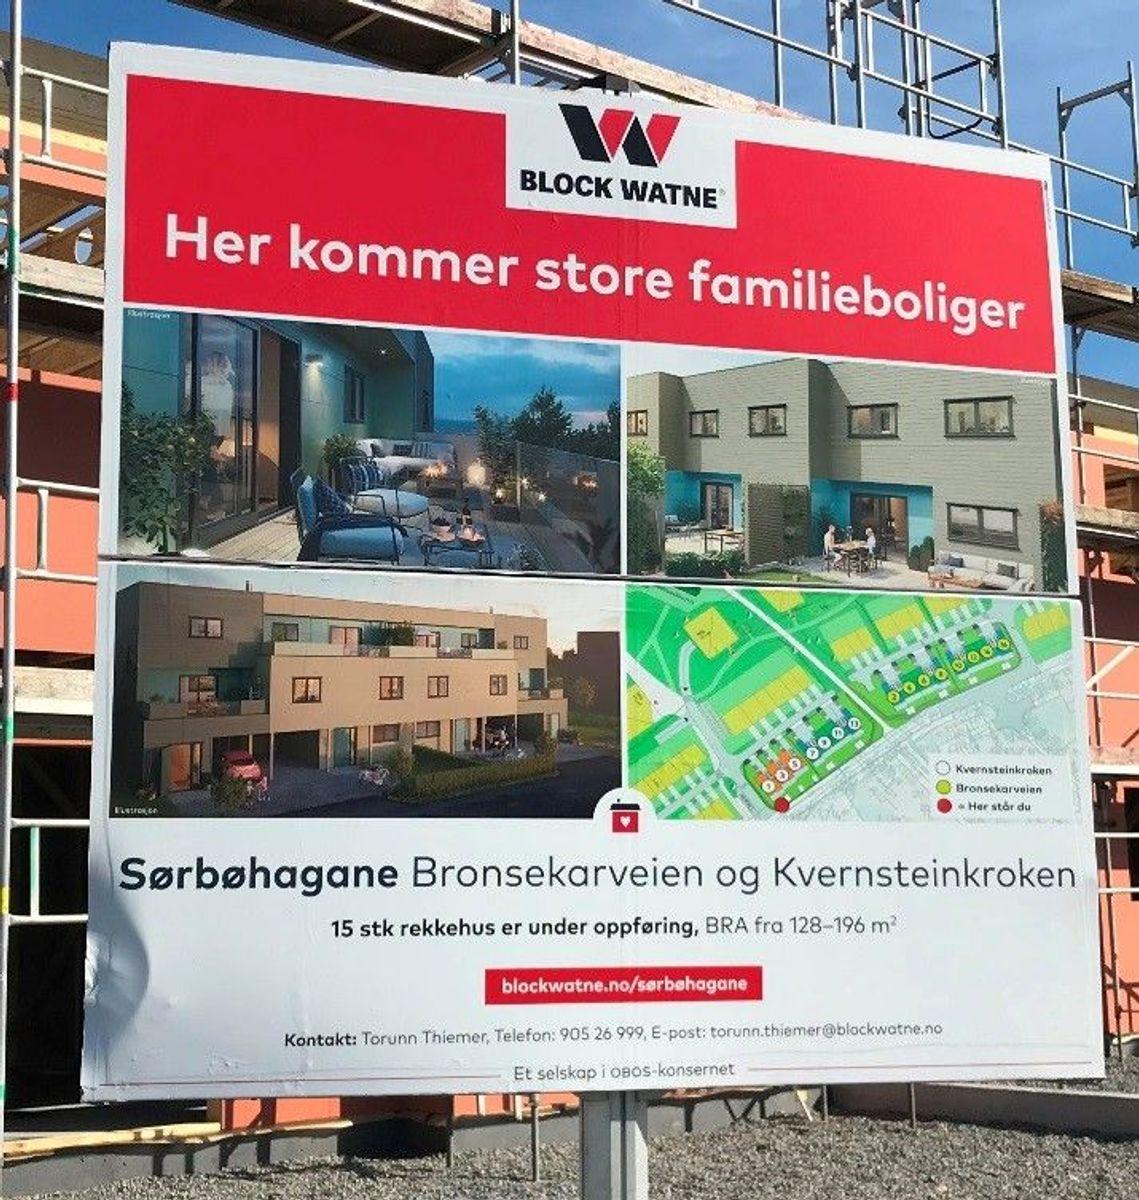 Block Watne, DK Forus, prosjekt Sørbøhagane.